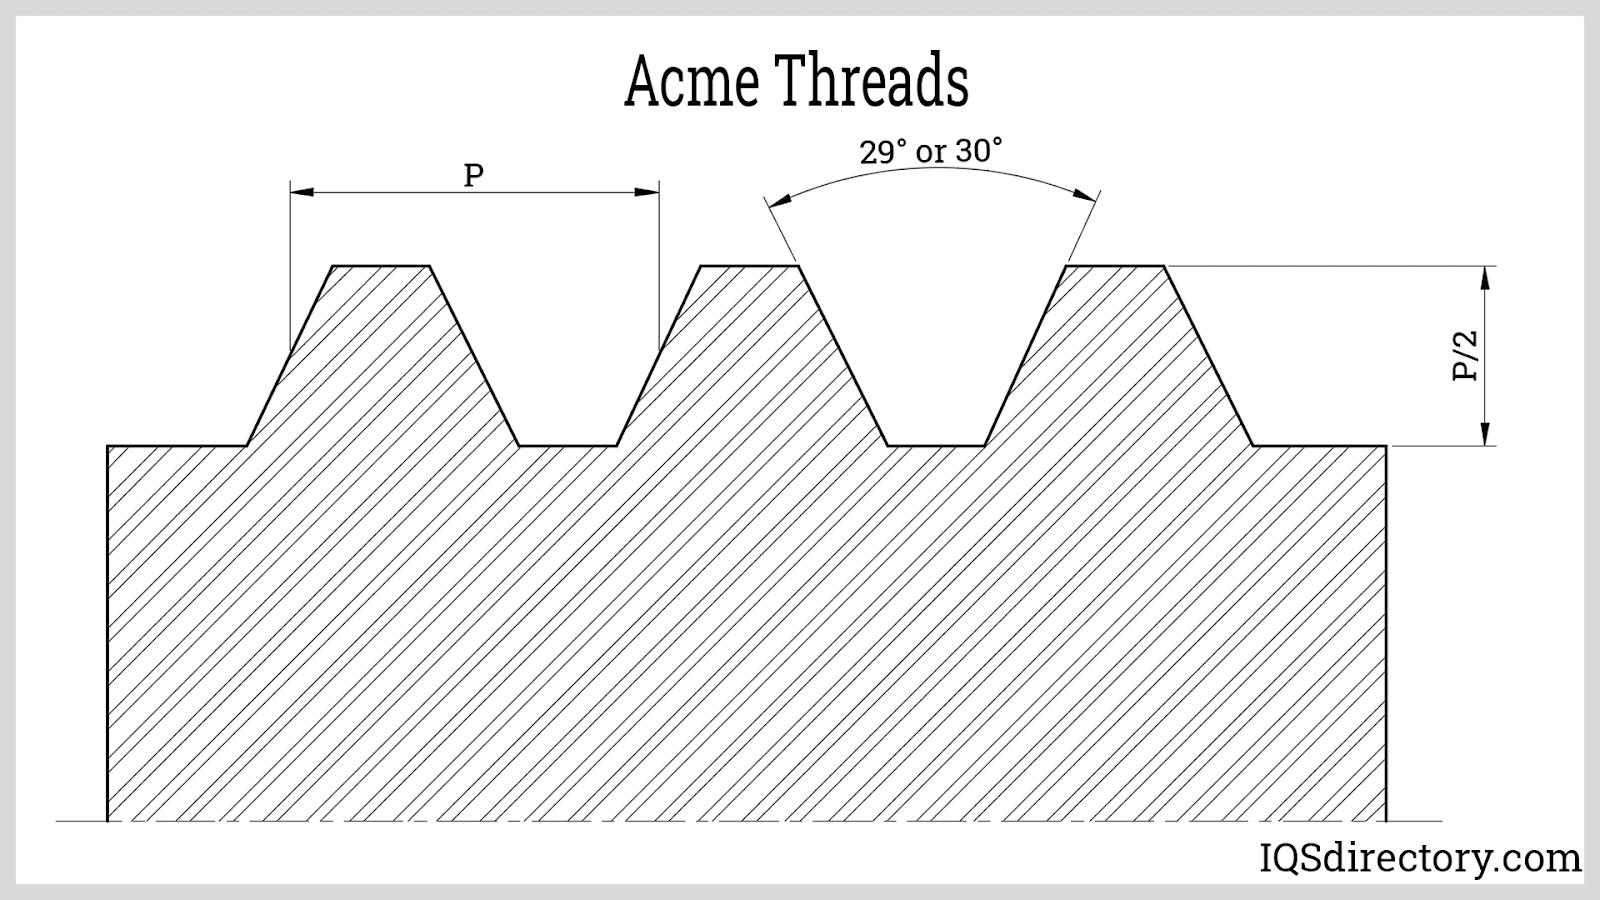 Acme Threads